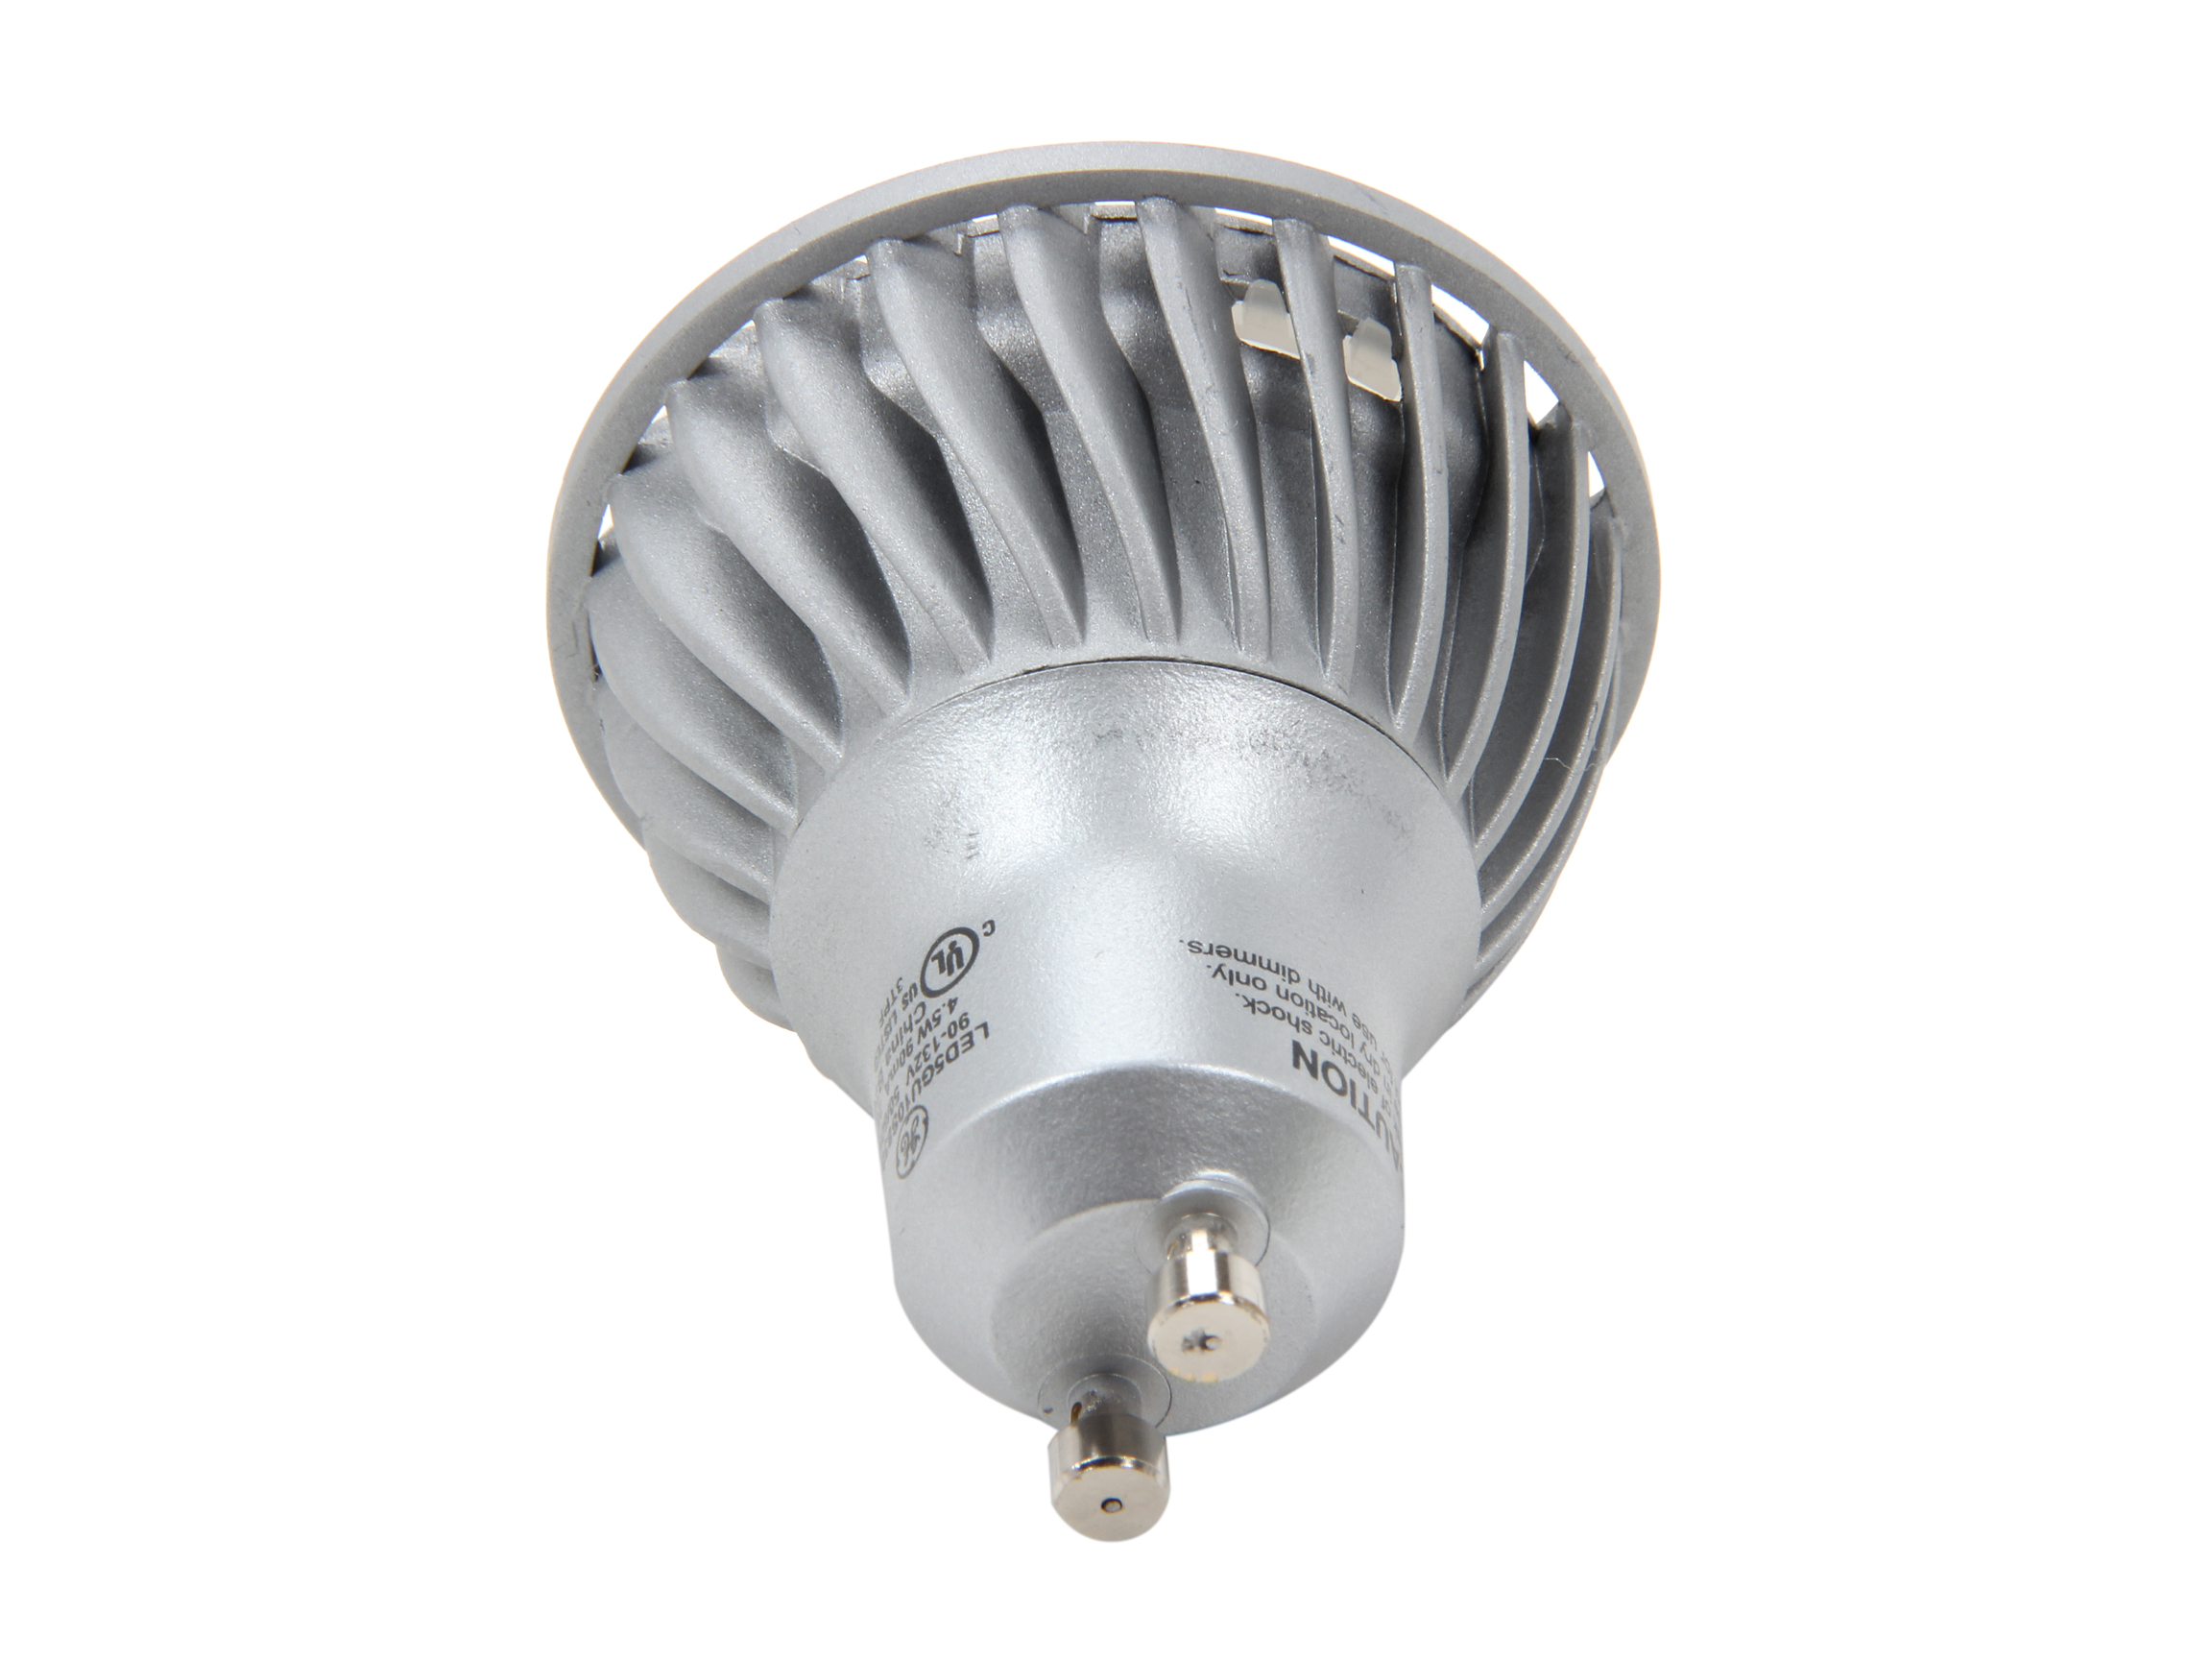 ge lighting 62909 35 watt equivalent led light bulb. Black Bedroom Furniture Sets. Home Design Ideas